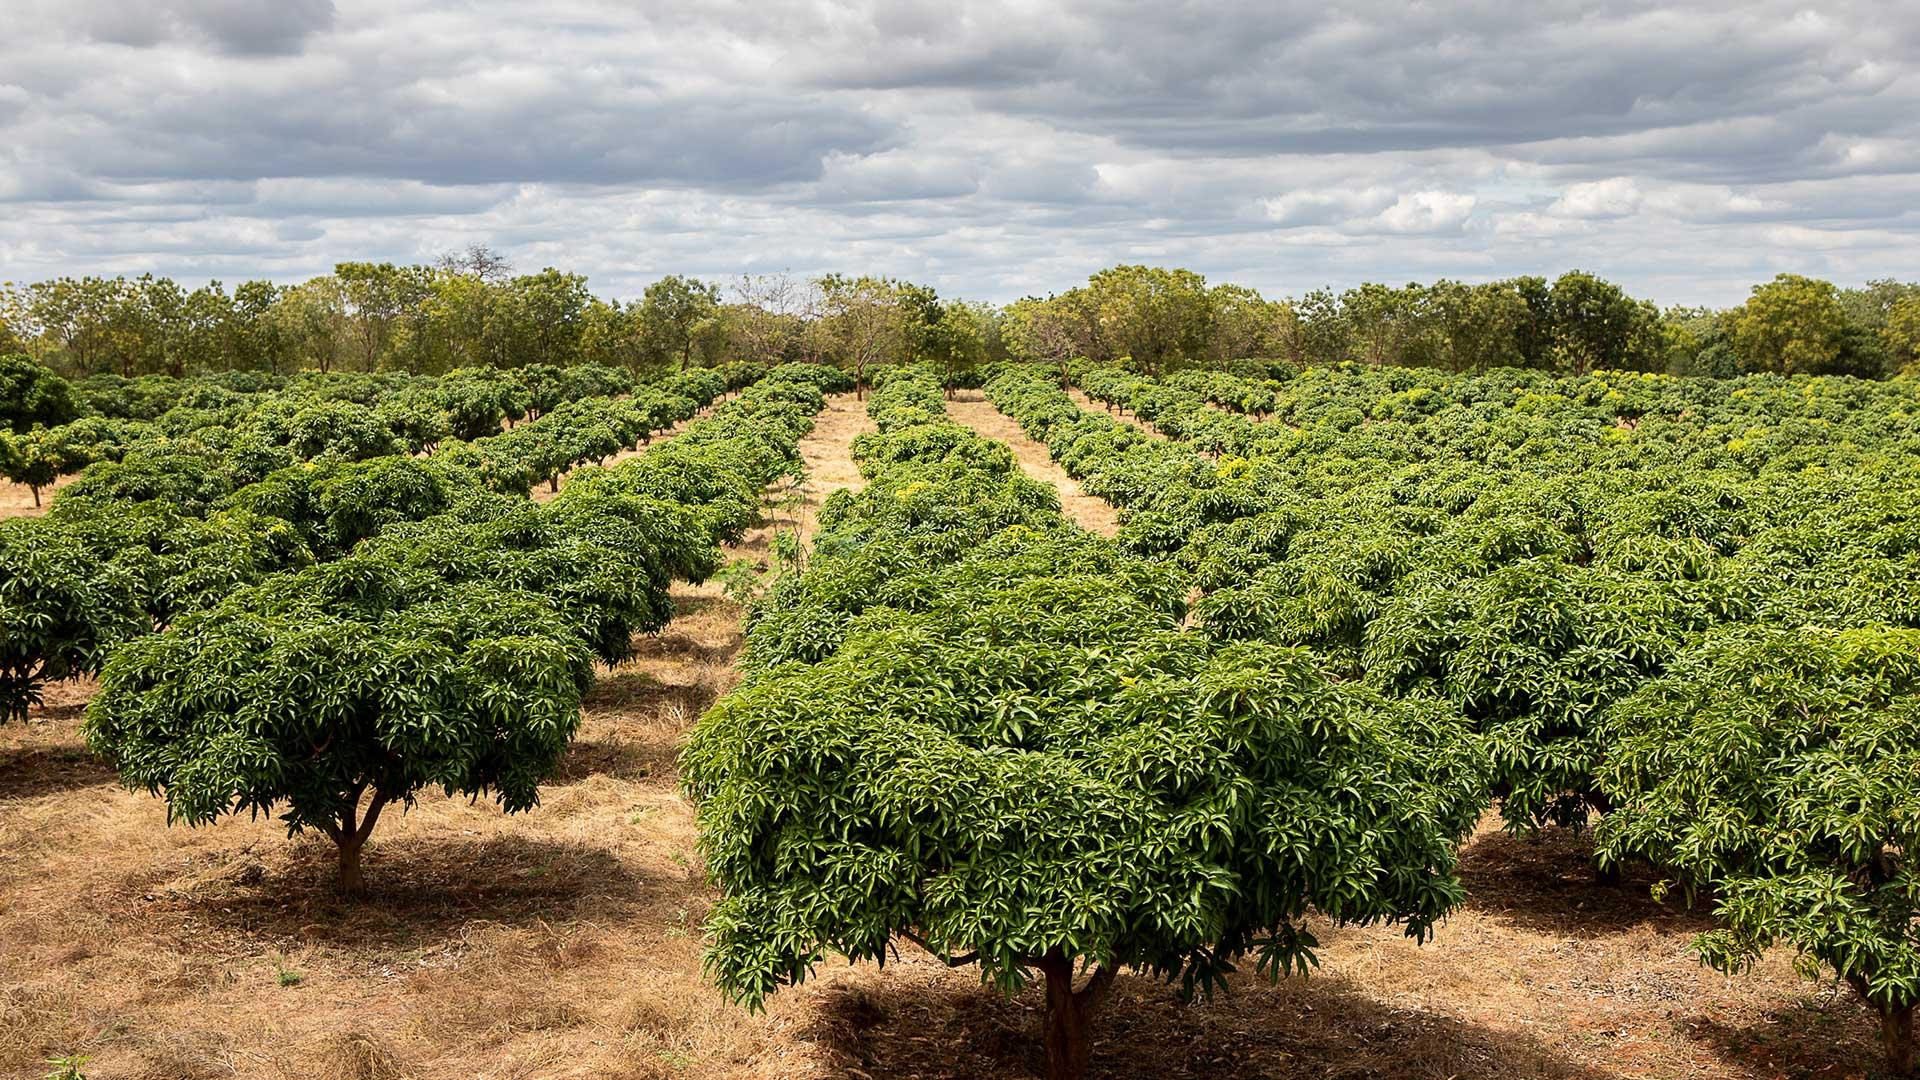 Mango trees on the test farm in Kibwezi